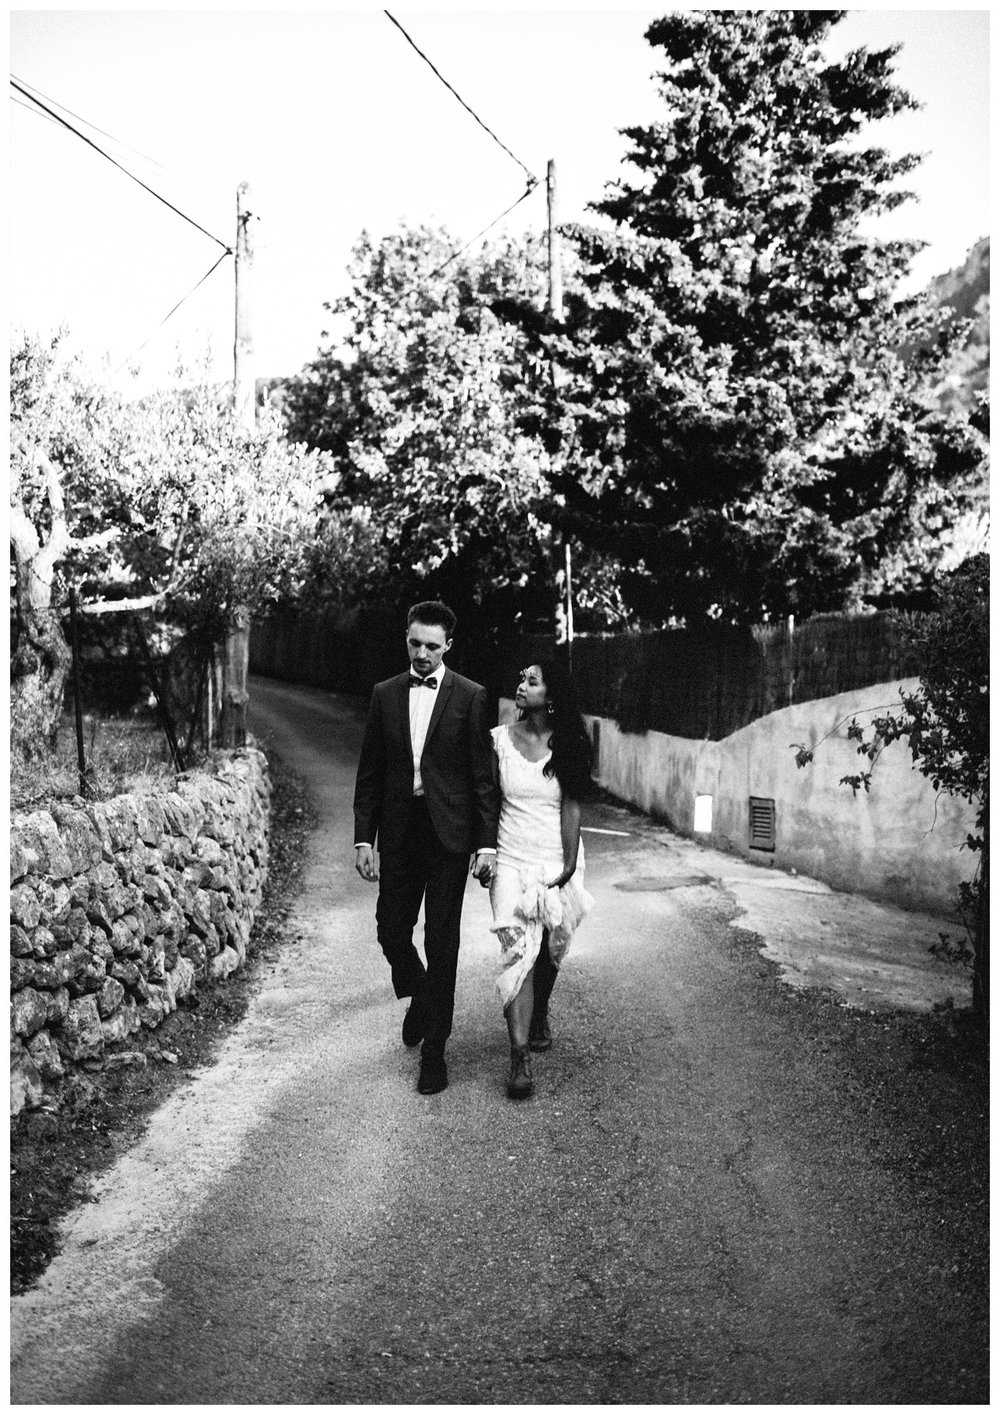 ohhedwig-hochzeitsfotografin-berlin-after-wedding-15